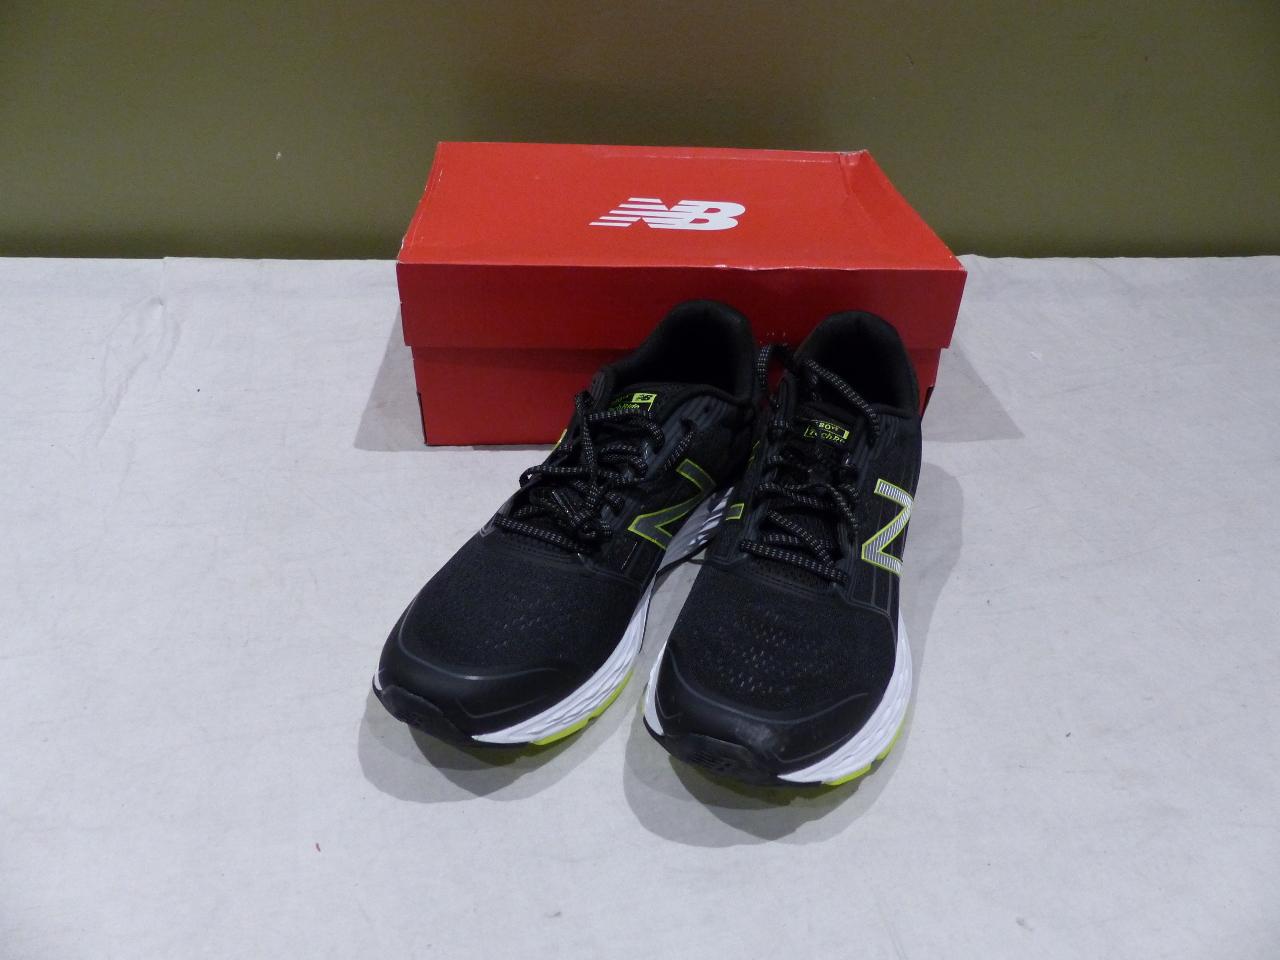 new balance 680 v5 mens running shoes